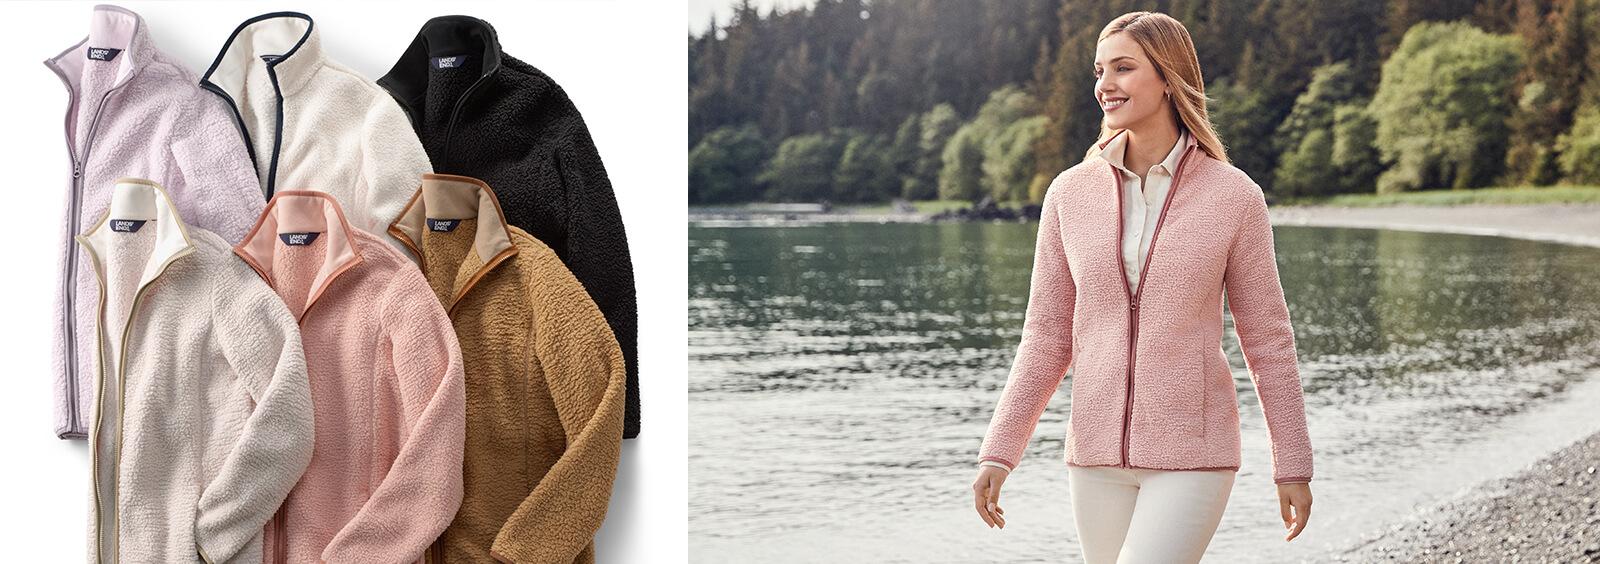 Why I Love My Fleece Jacket